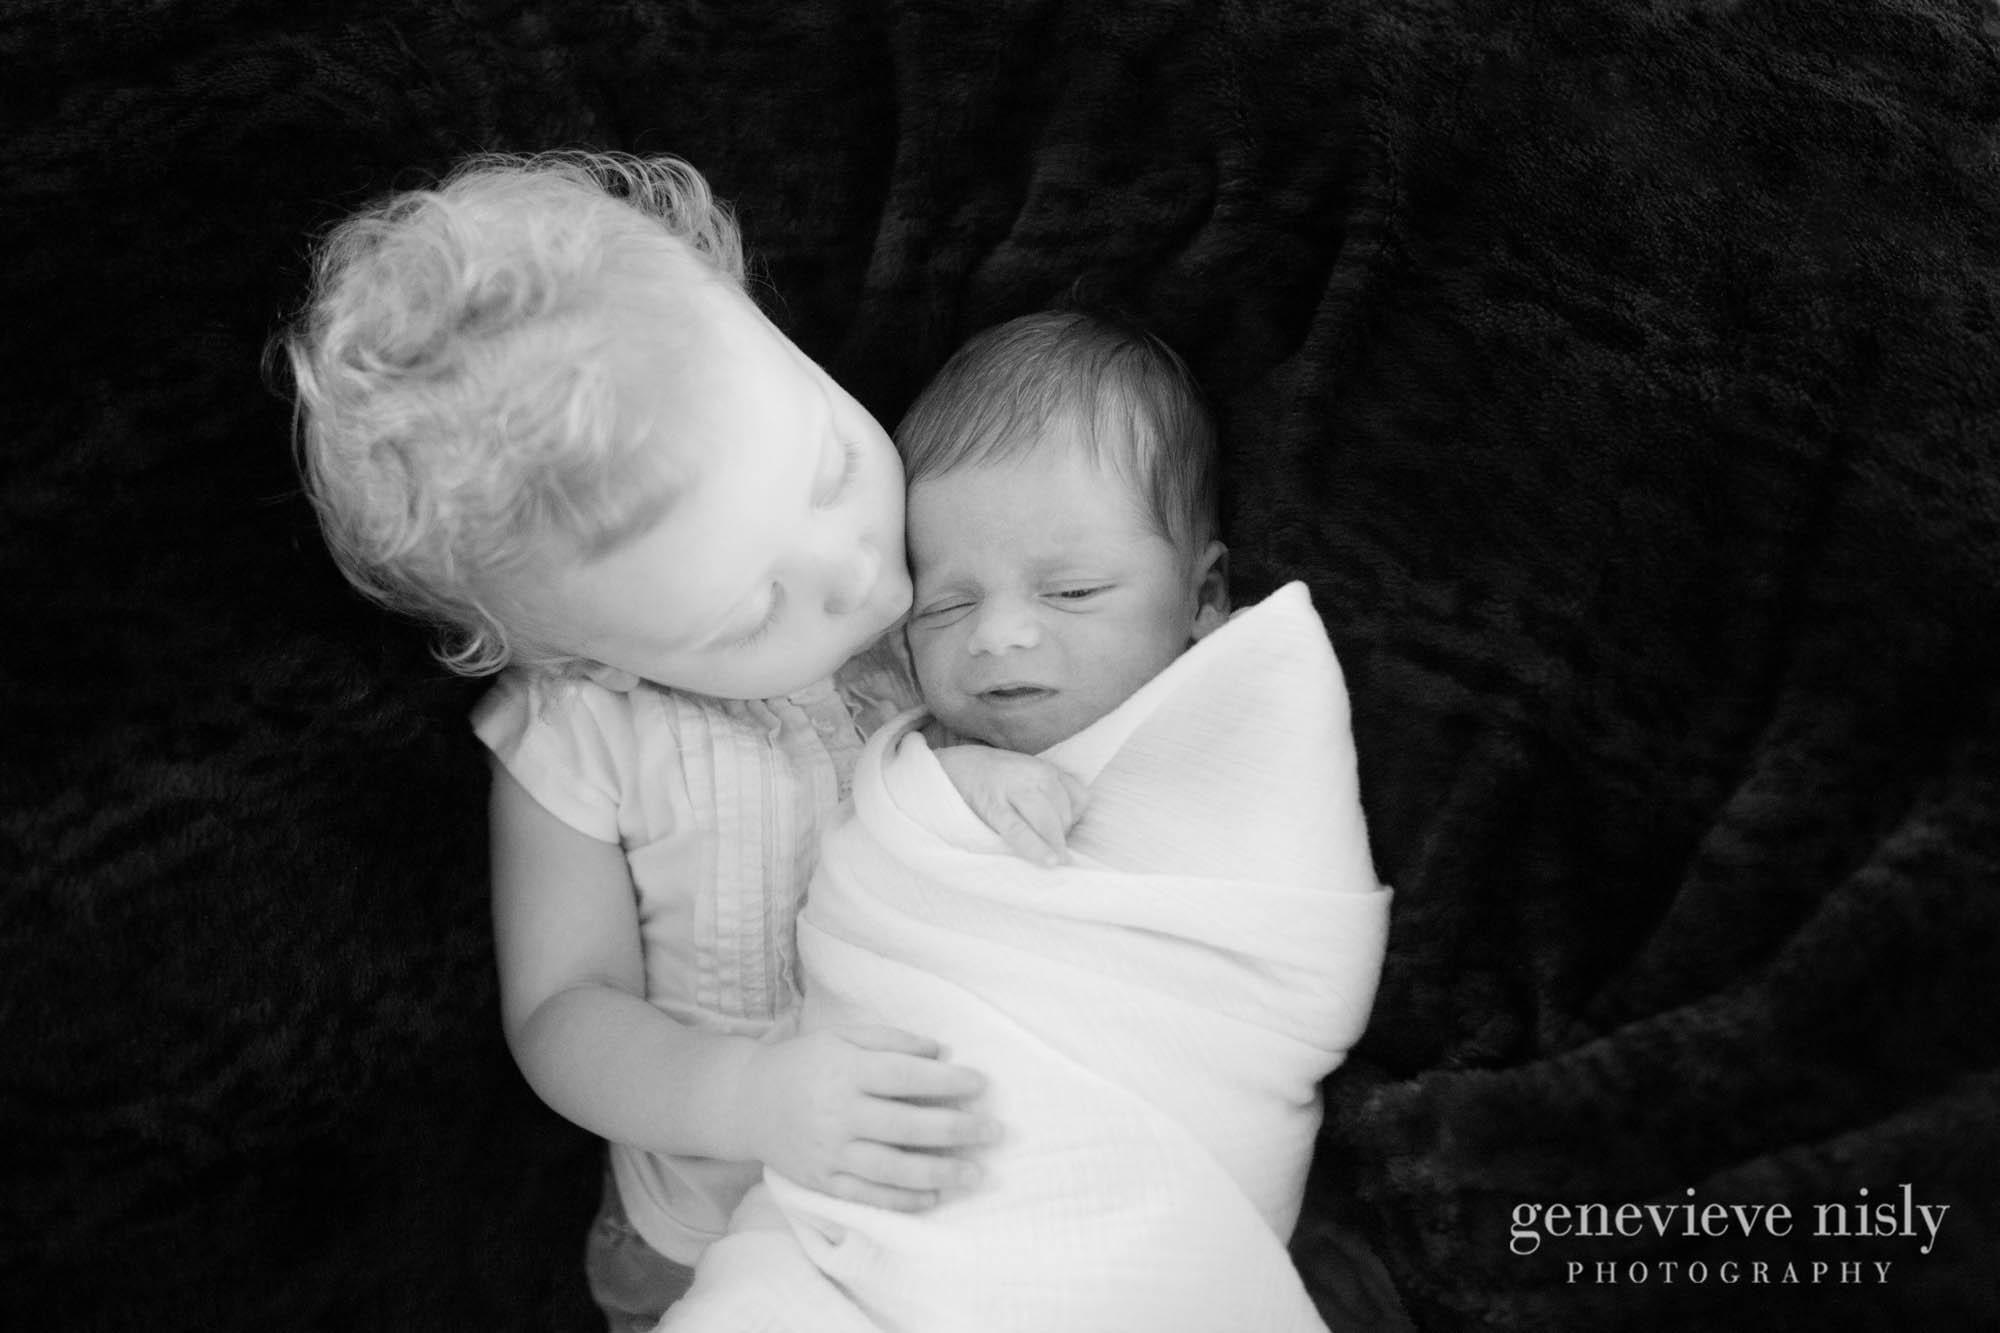 Baby, Copyright Genevieve Nisly Photography, Family, Ohio, Portraits